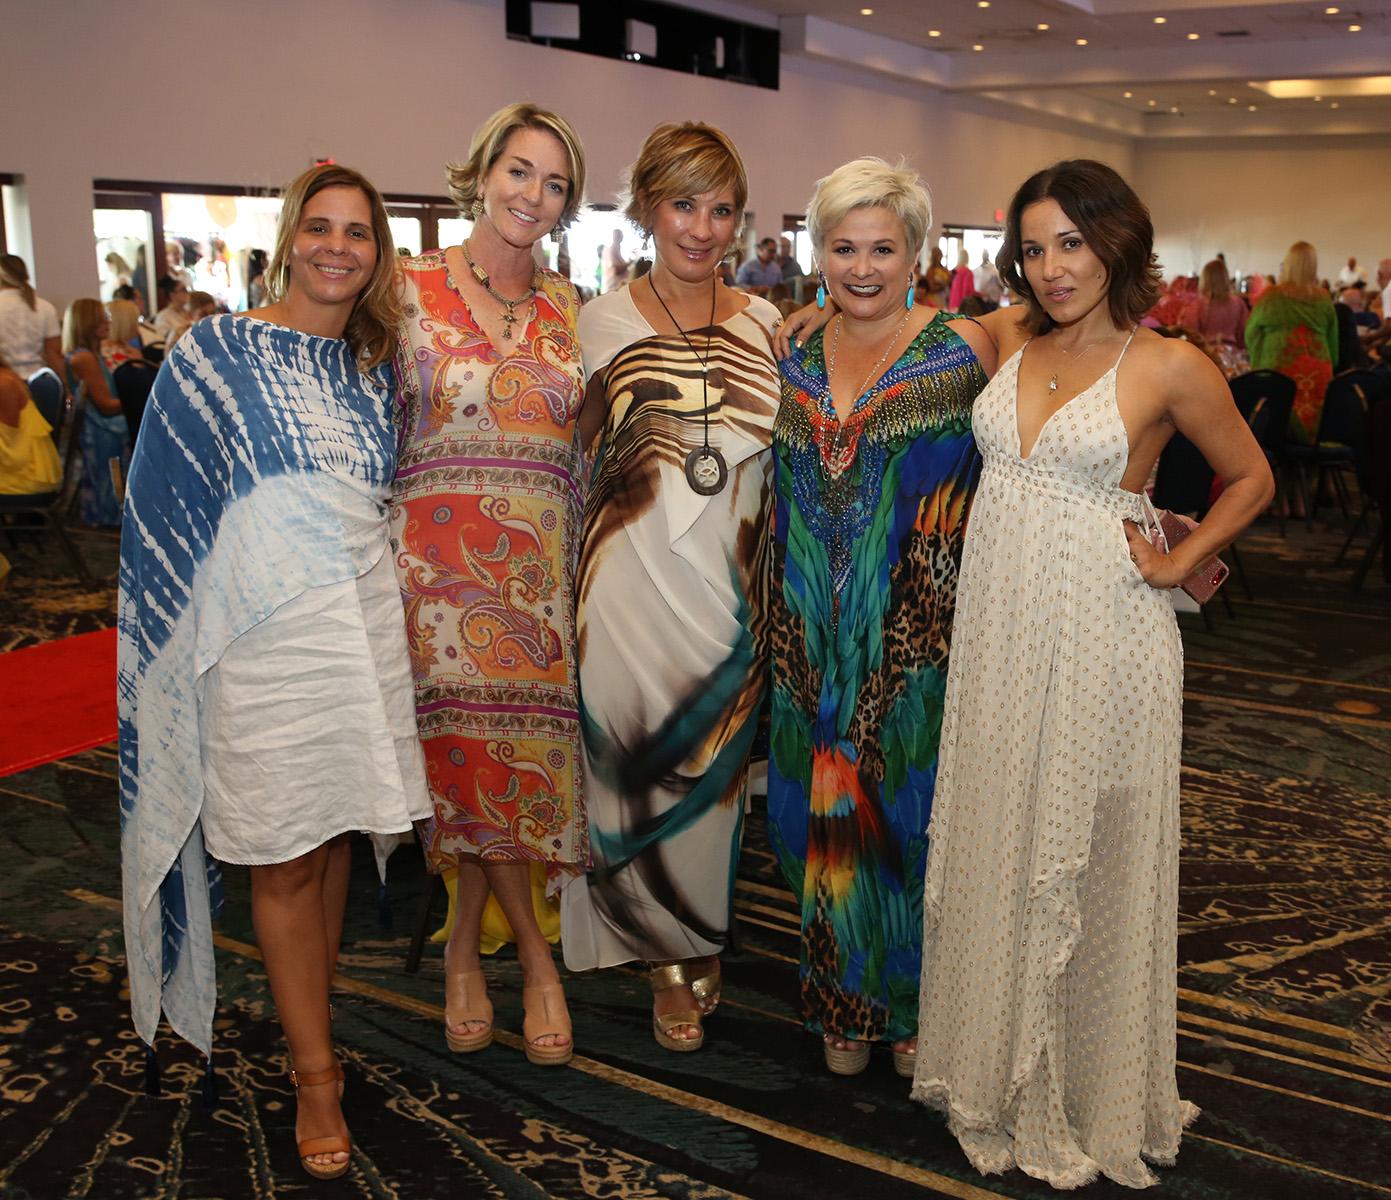 Sara Díaz Velarde, Valentina Proutty, Margarita Corral, Ana González y Patricia Beato. Fotos José Rafael Pérez Centeno